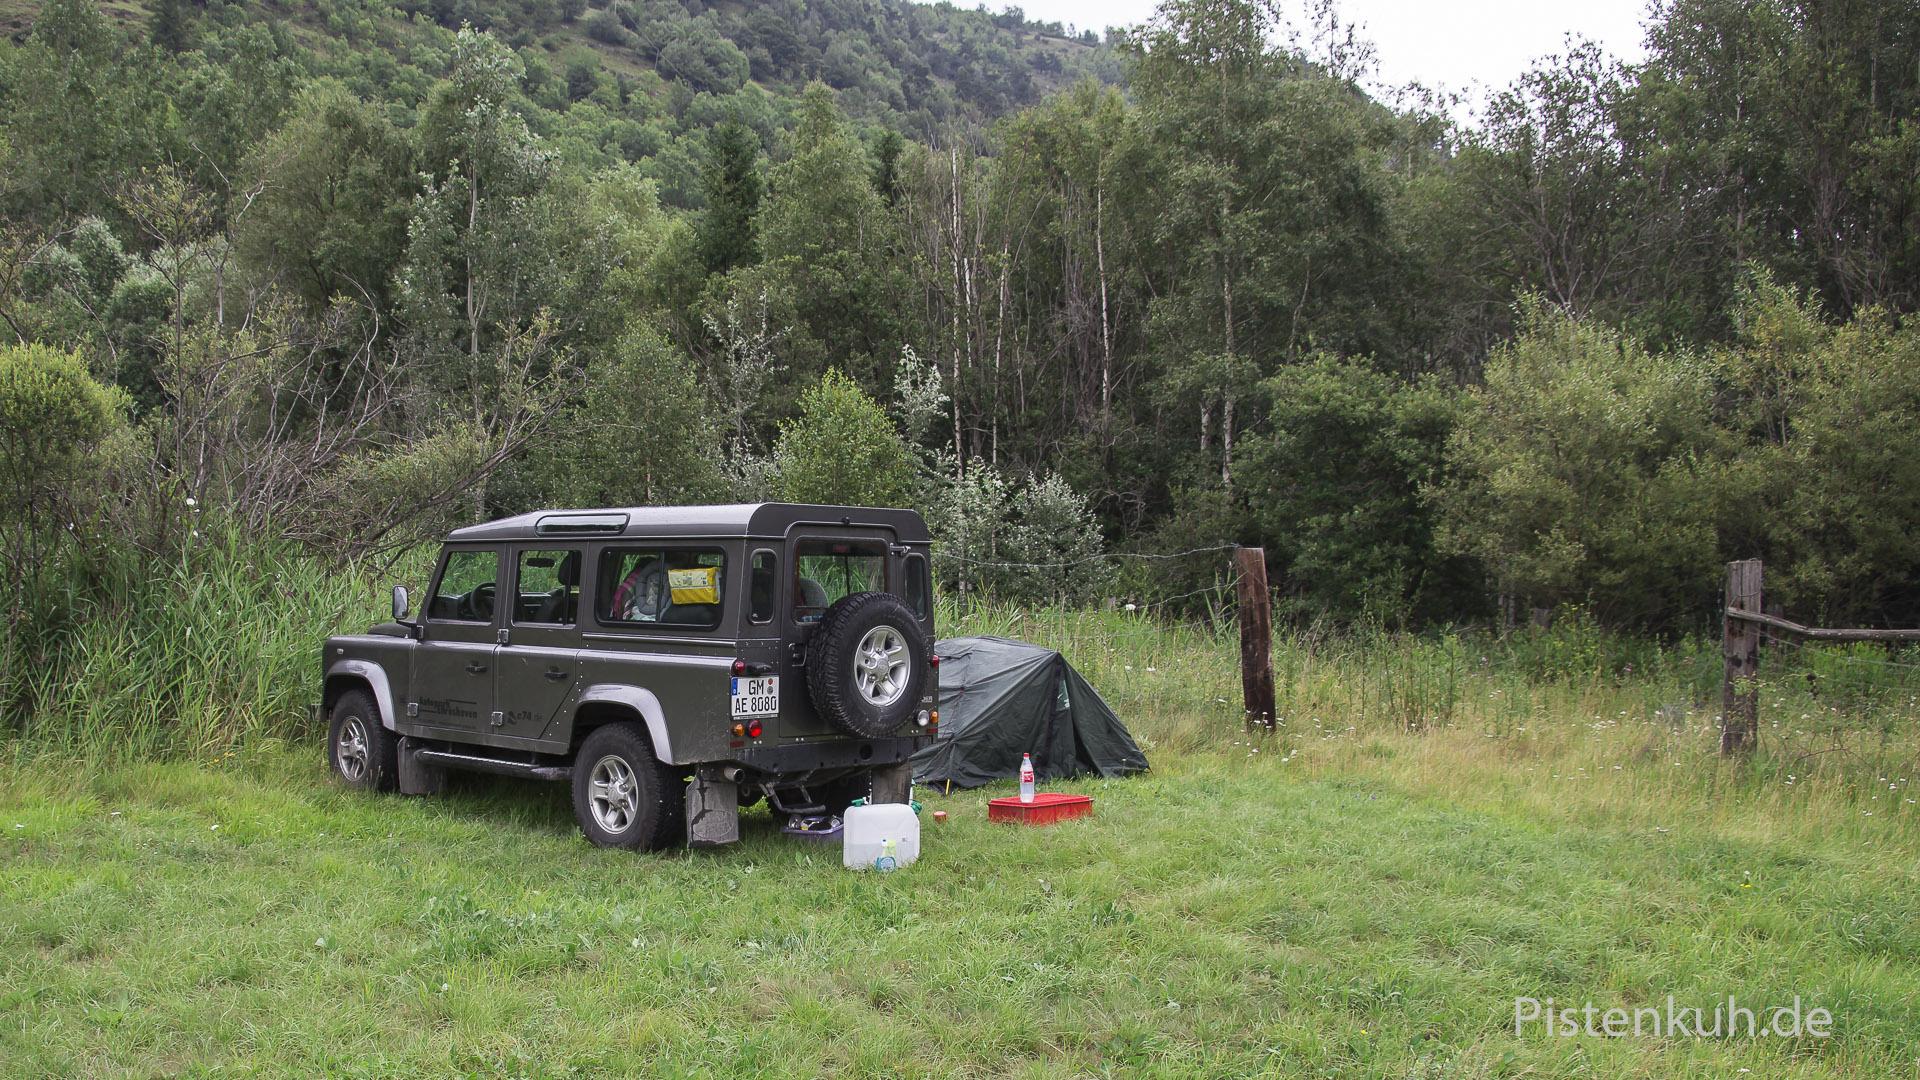 freies campen